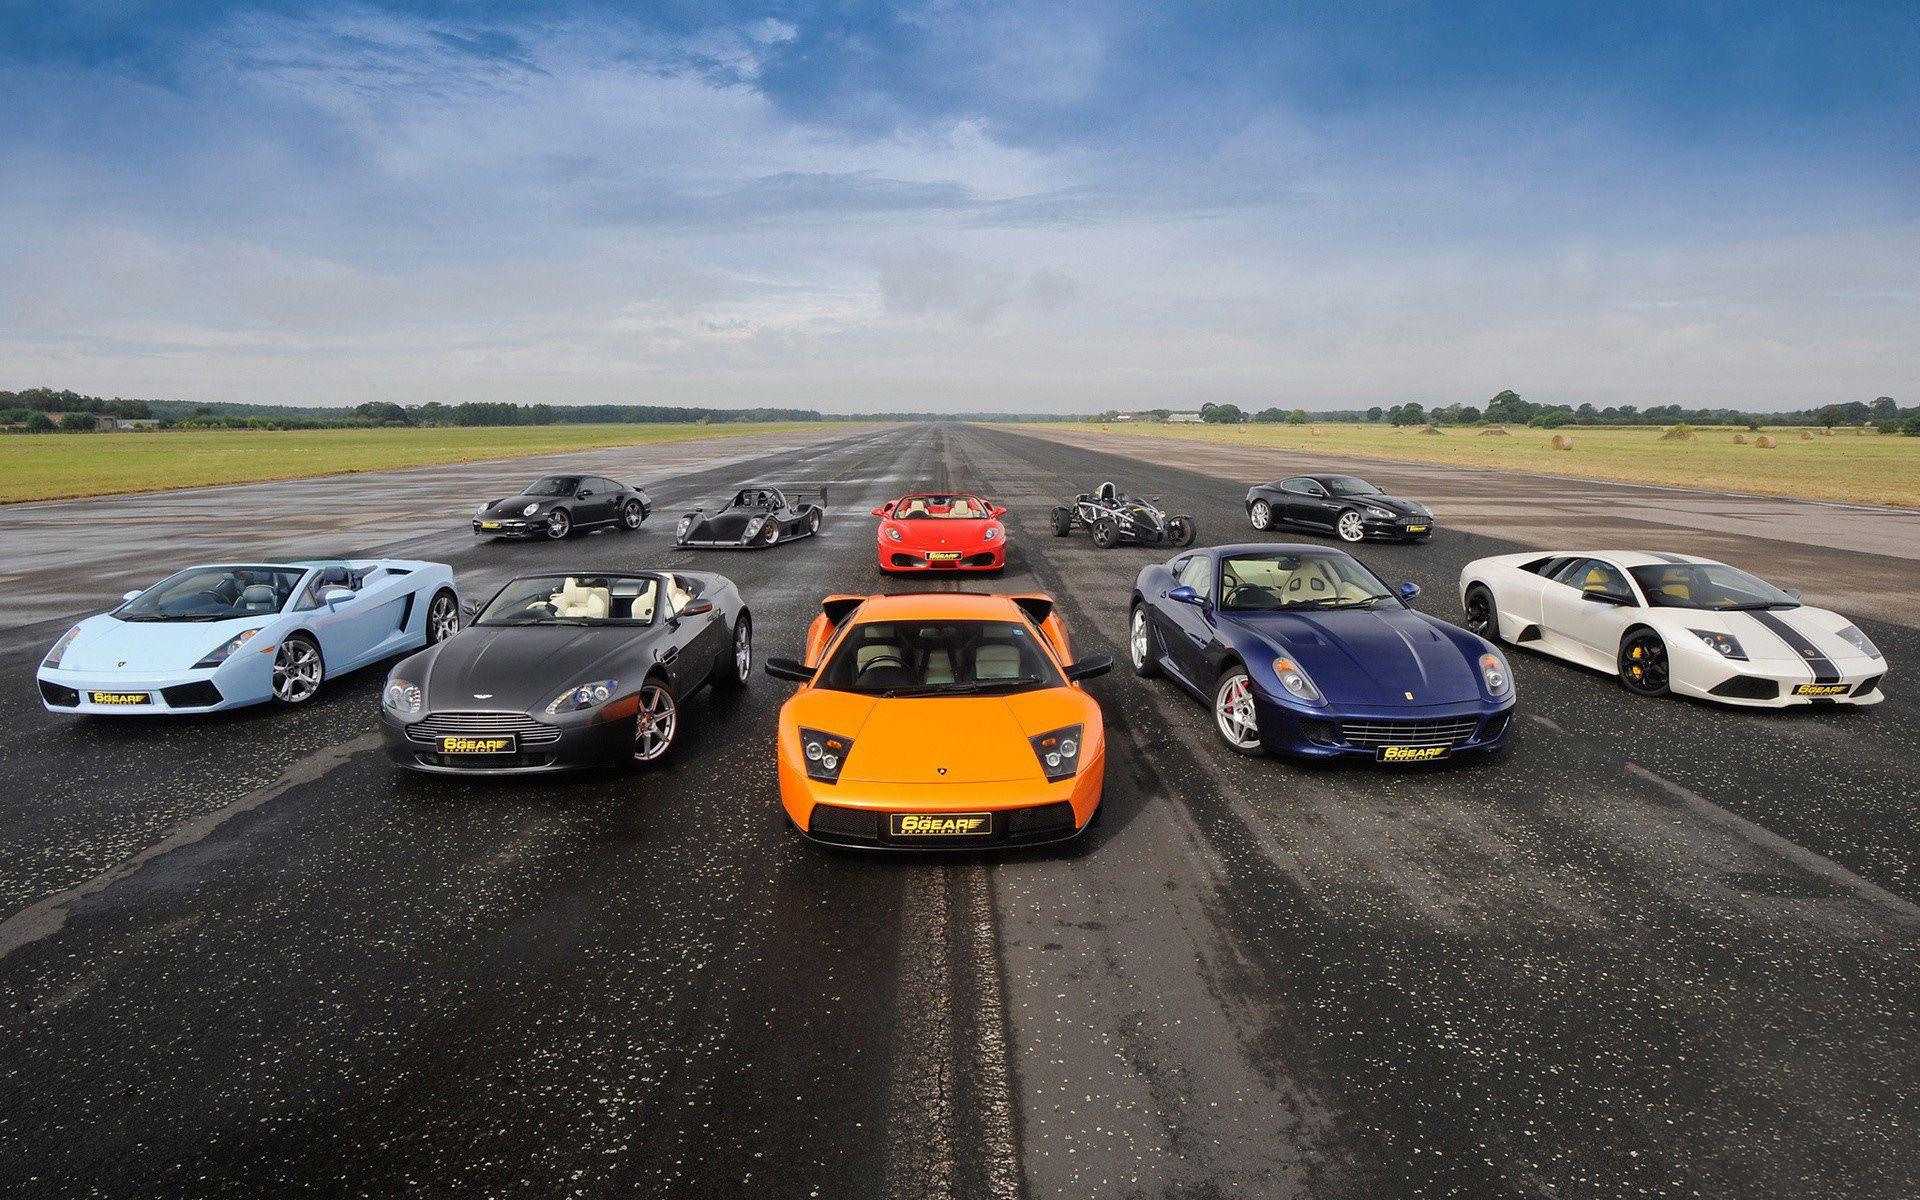 street racing cars | 6th Gear Racing Cars | CARS/LOW RIDERS/TRUCKS ...